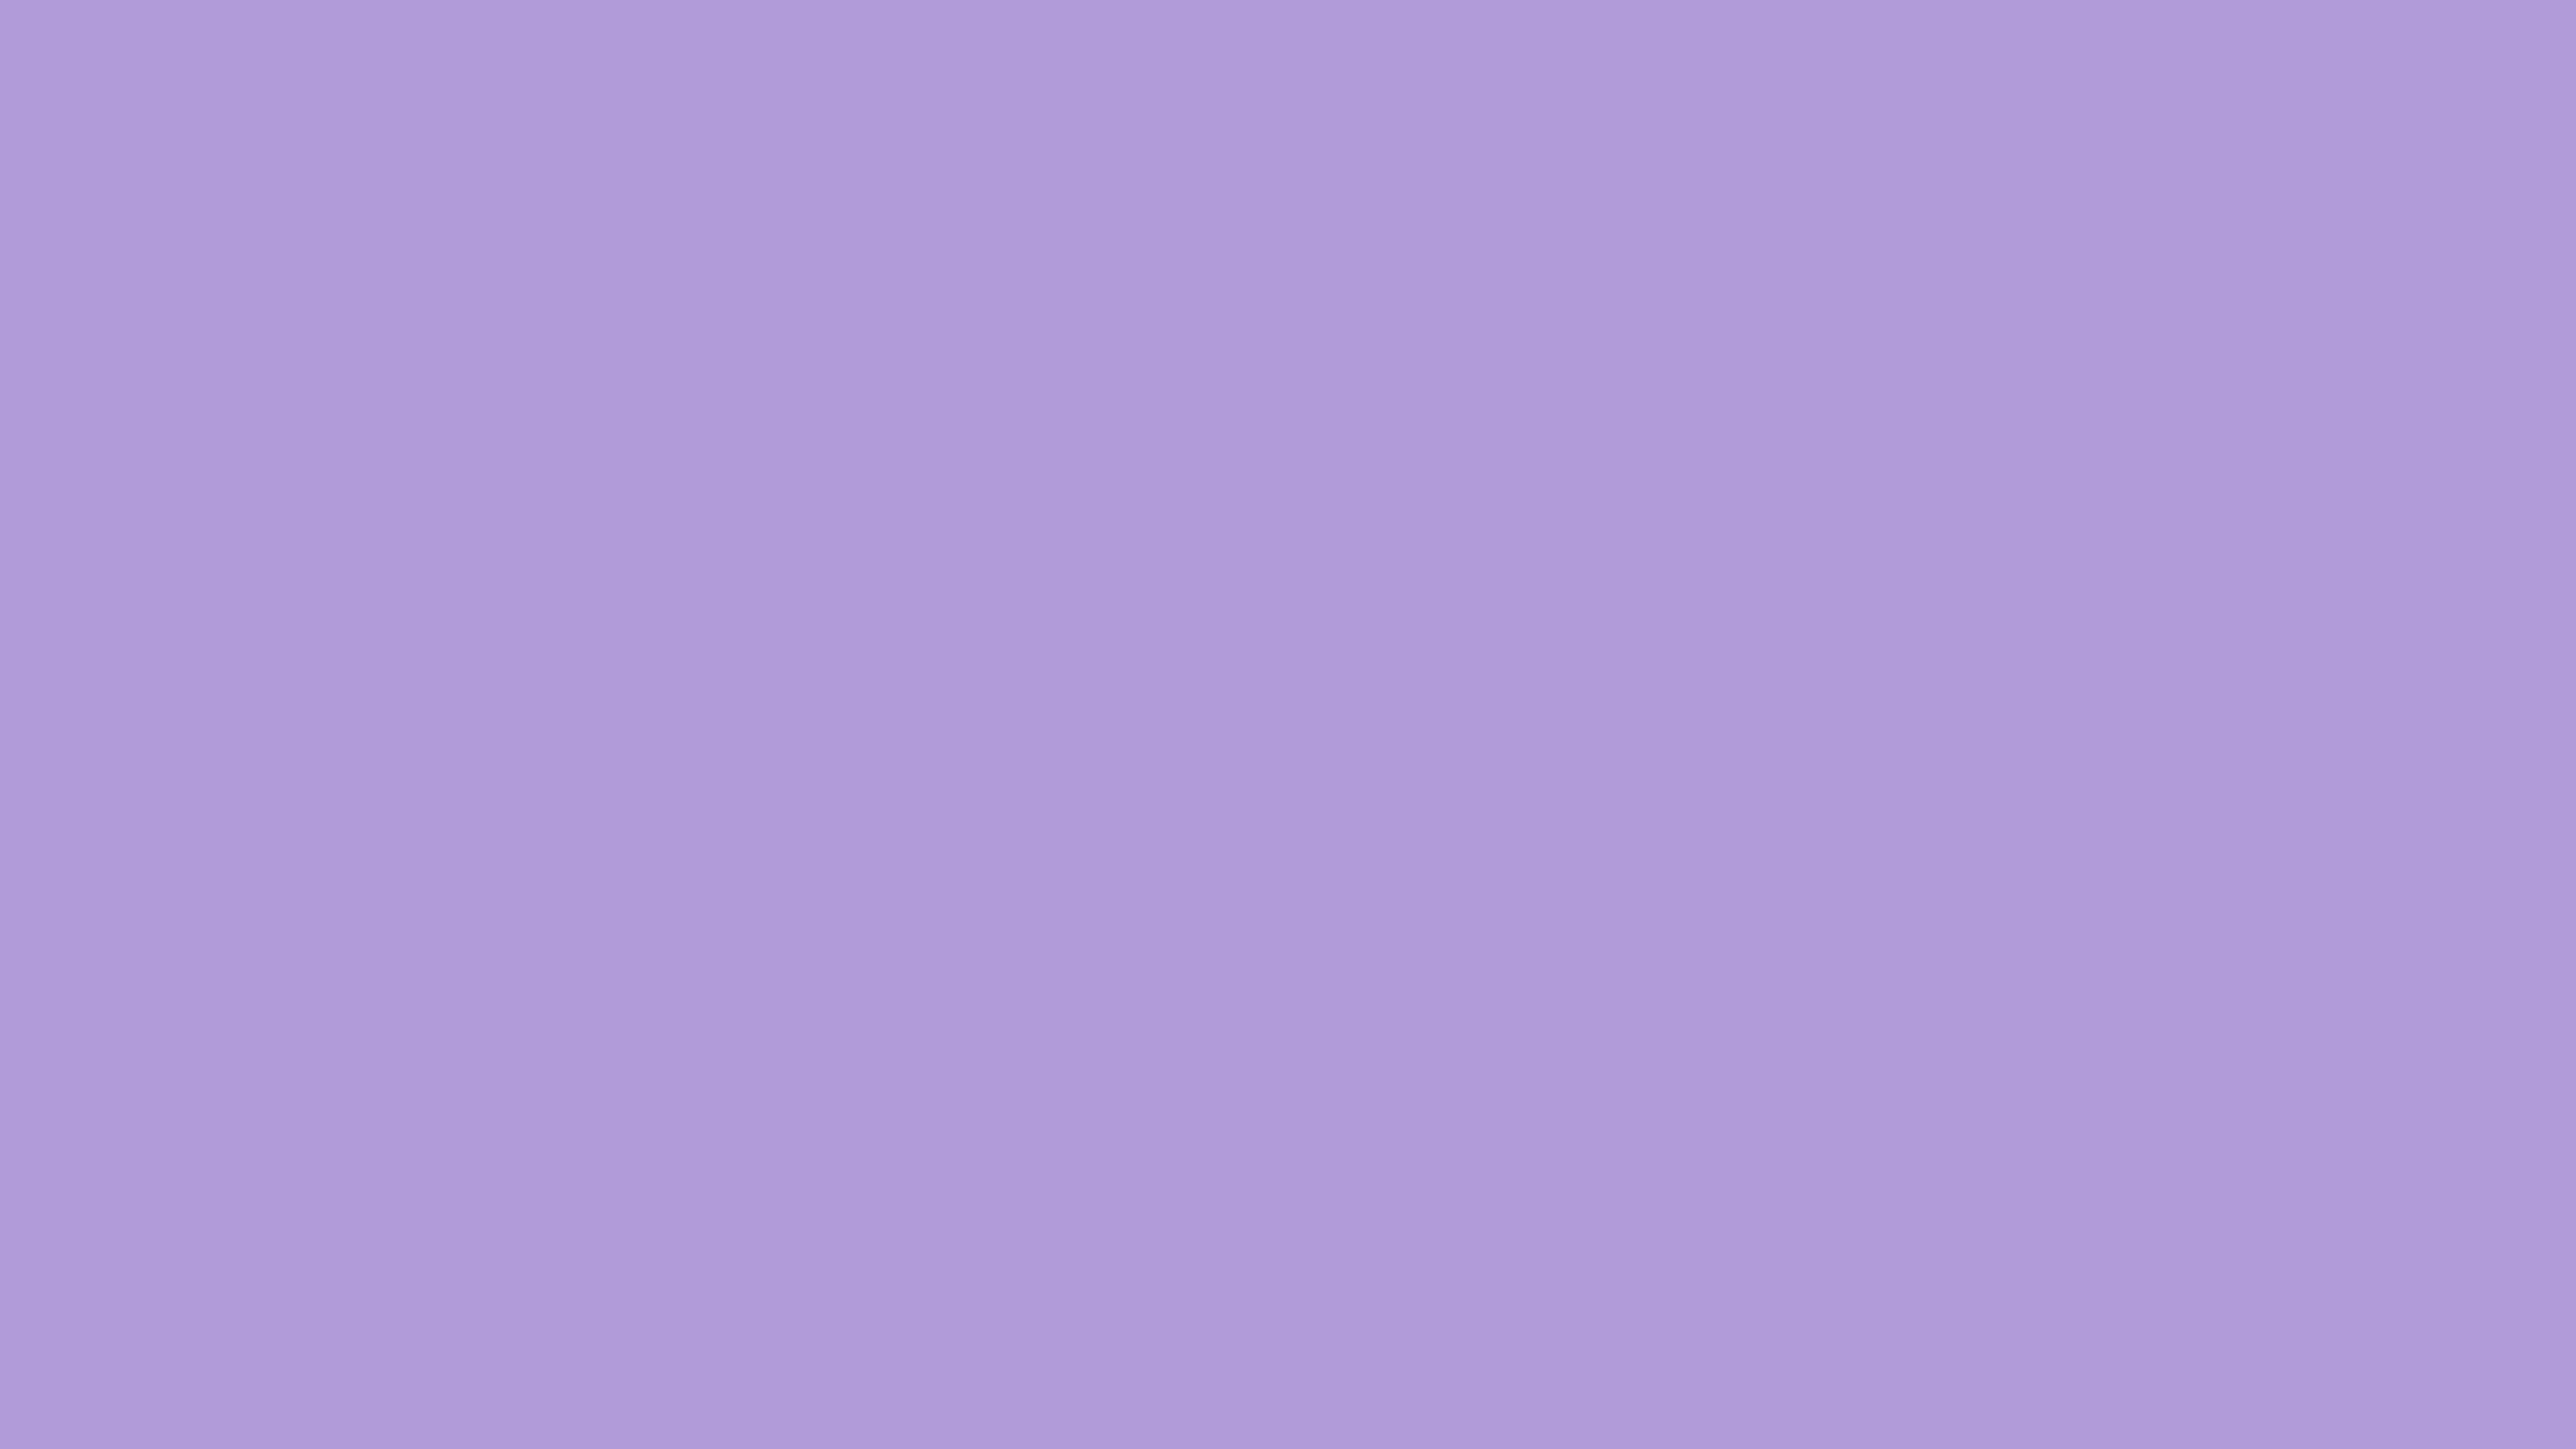 3840x2160 Light Pastel Purple Solid Color Background